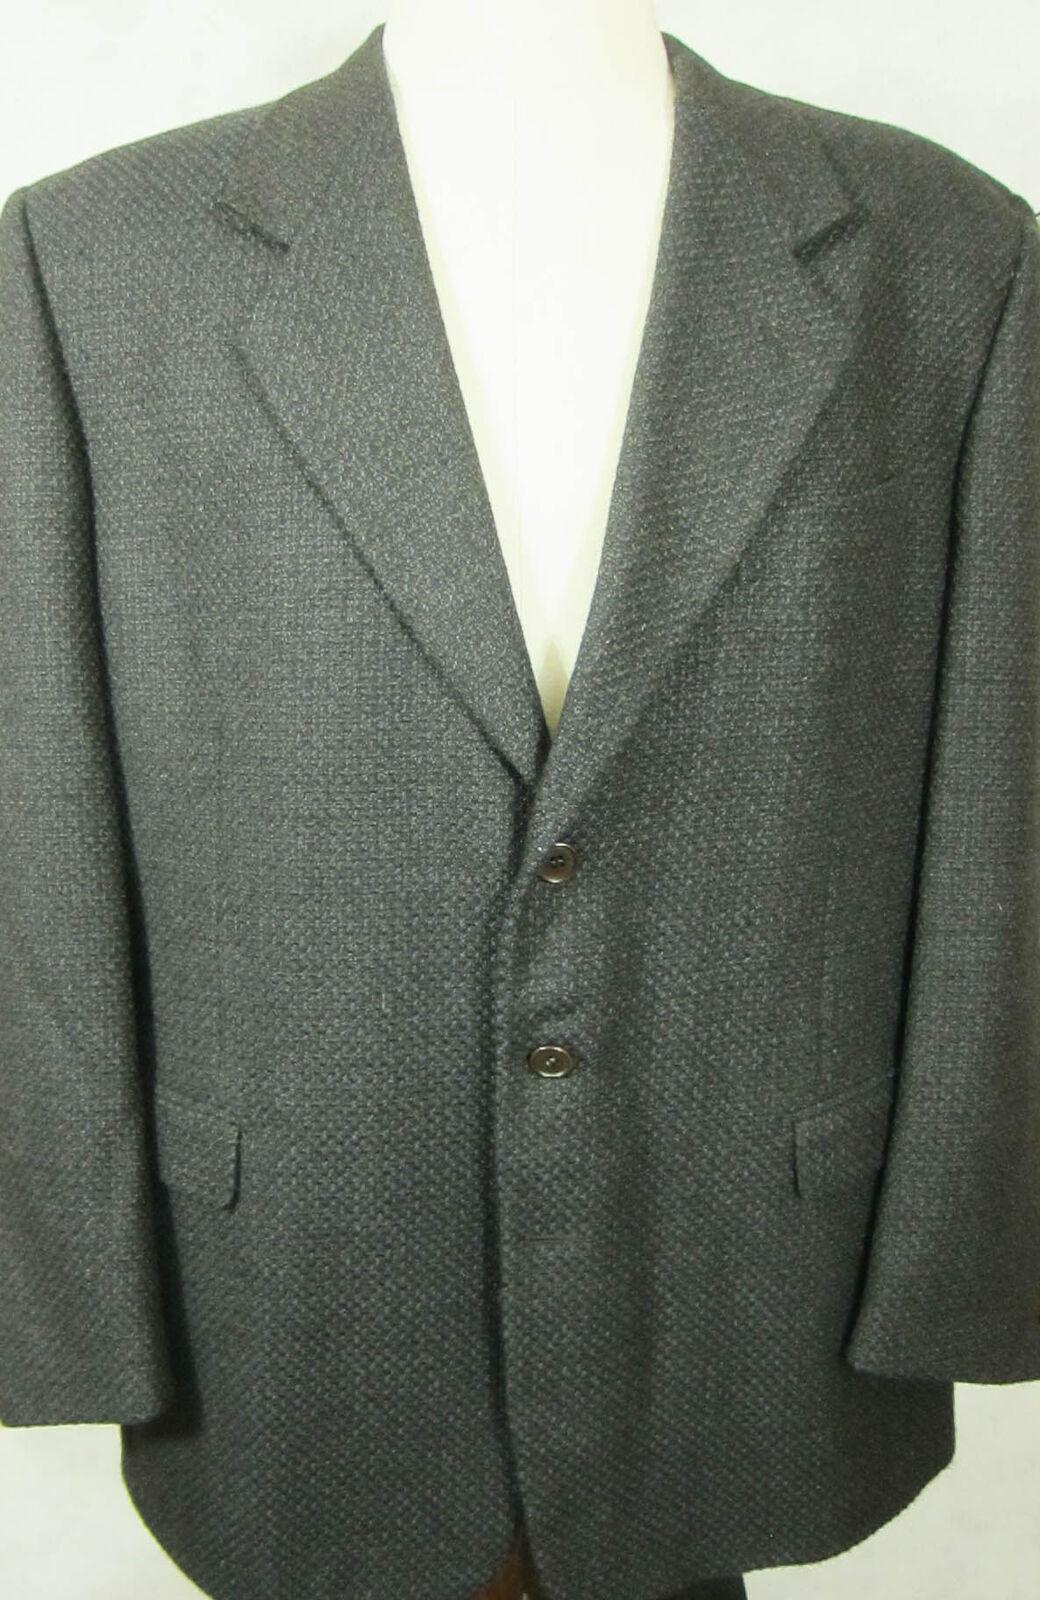 GORGEOUS Pal Zileri Dark grau With Blau Braun Heavy Wool Sport Coat 46R